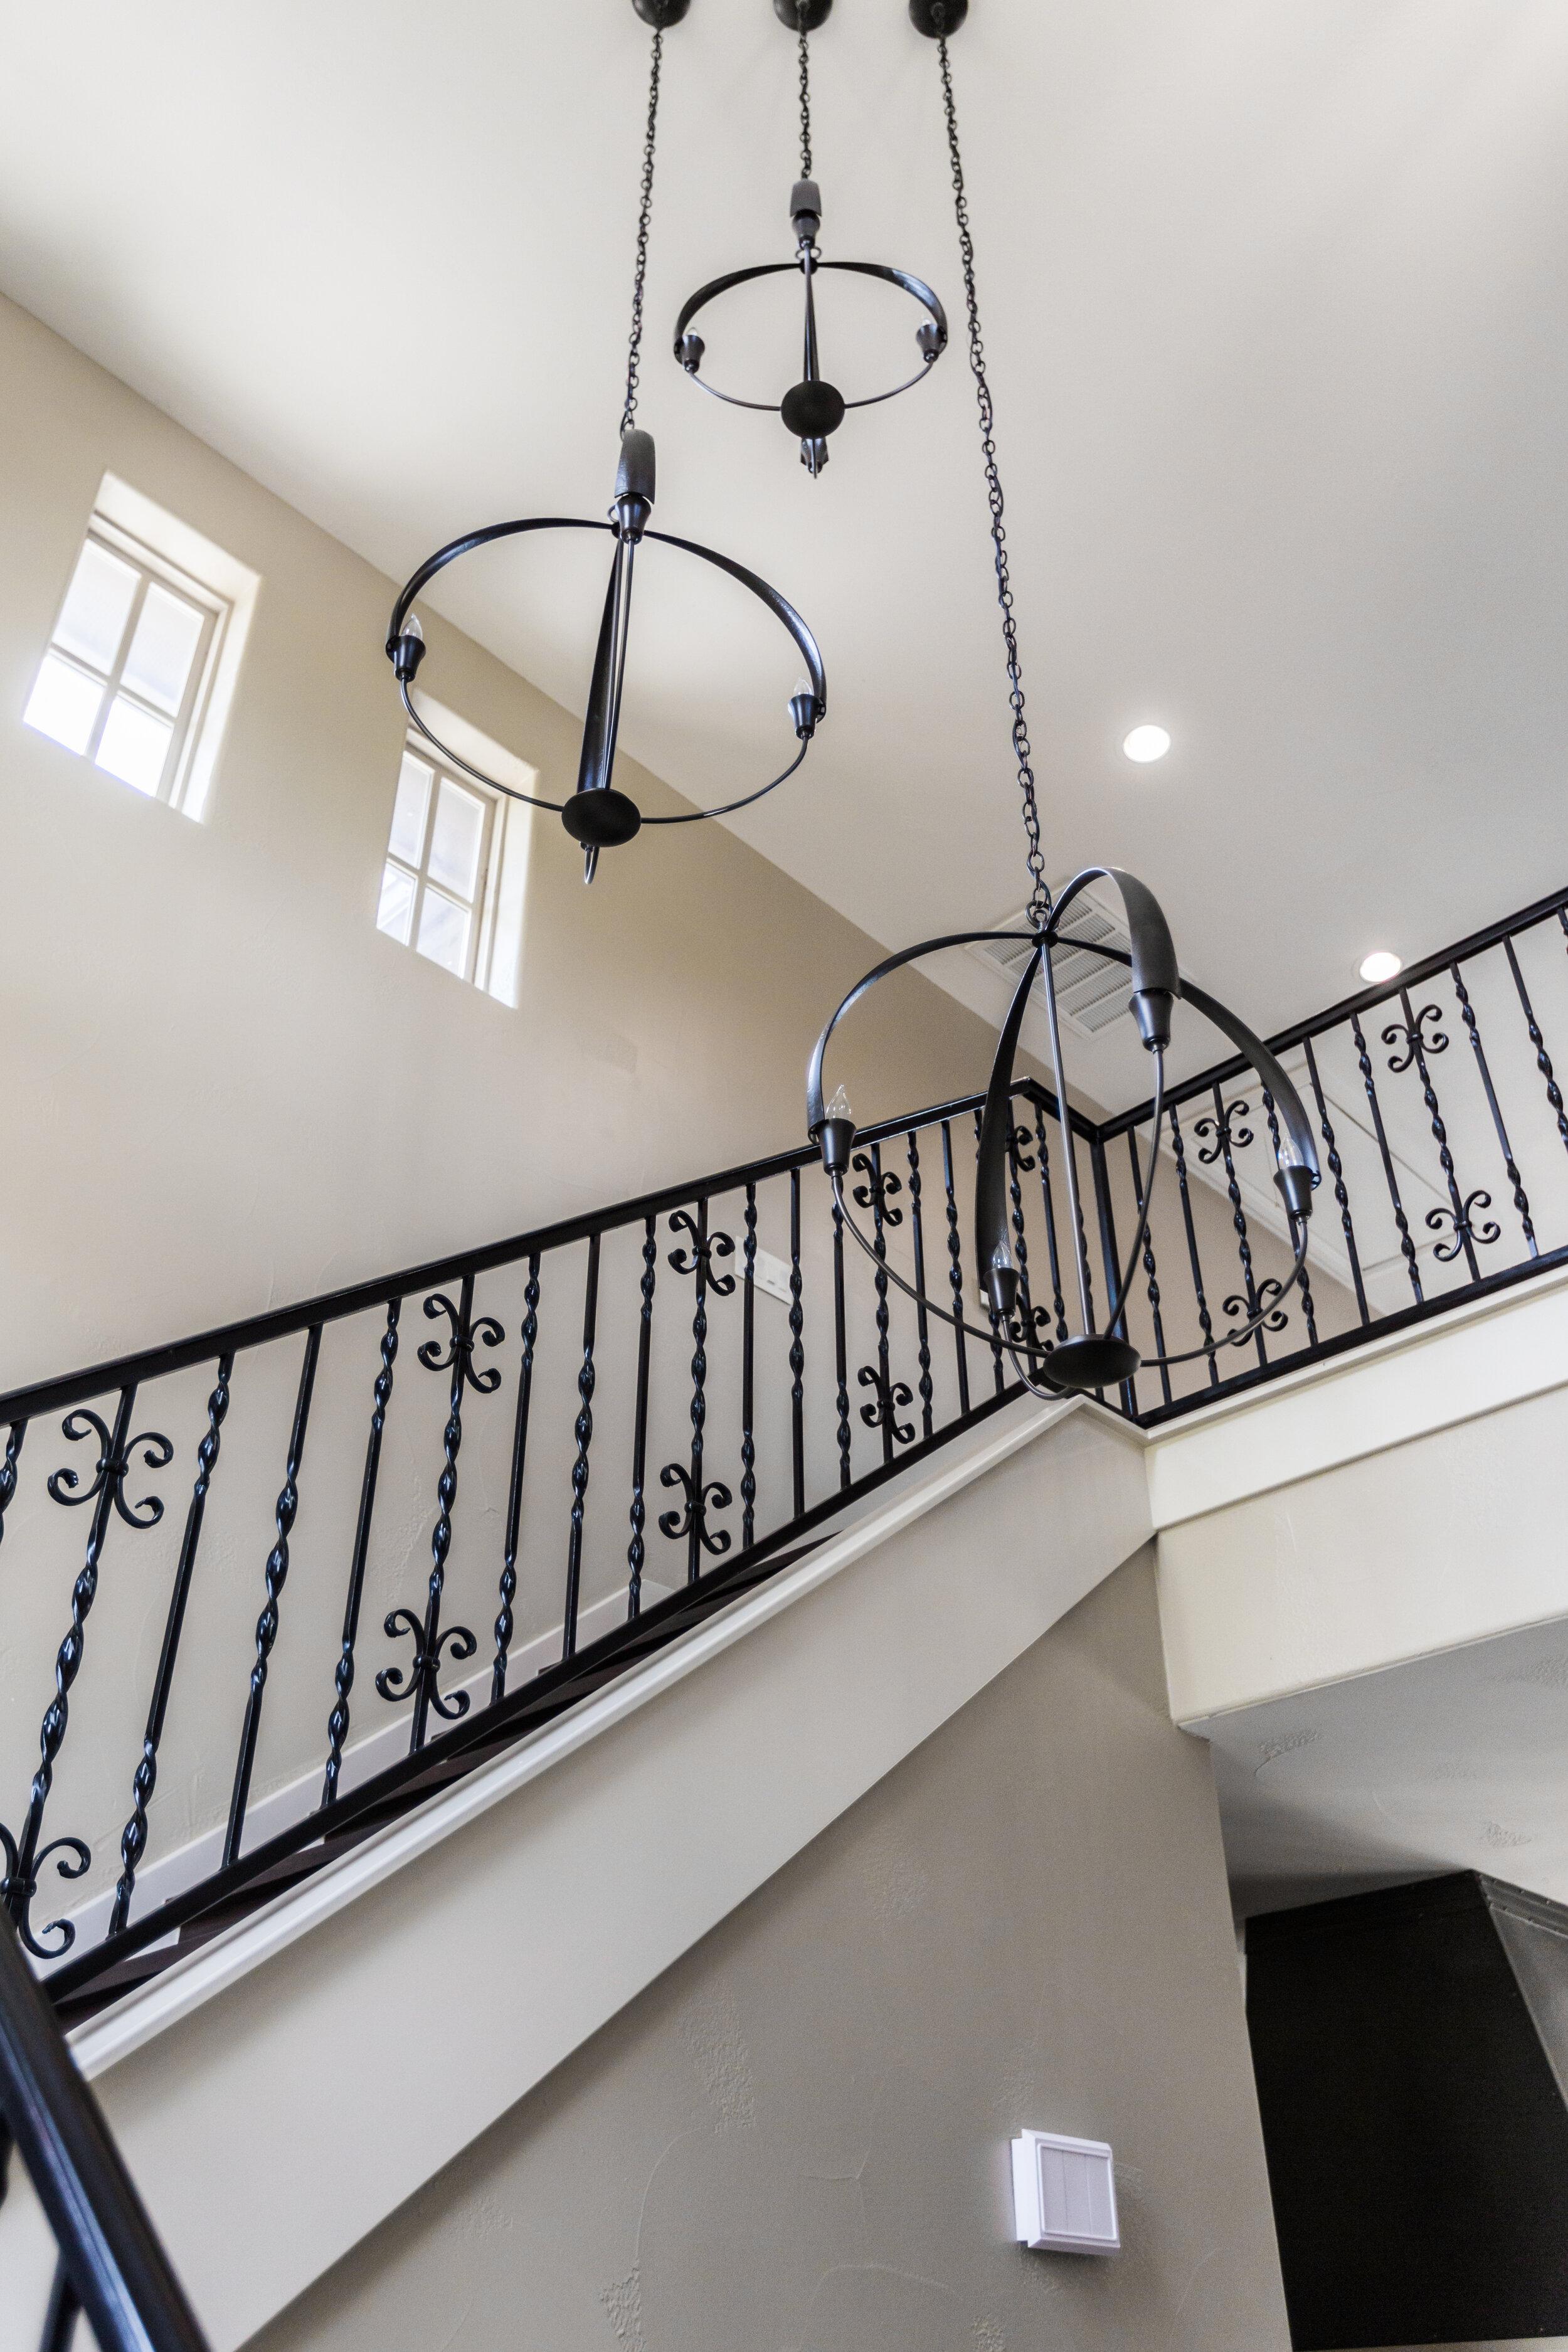 transitional chandelier